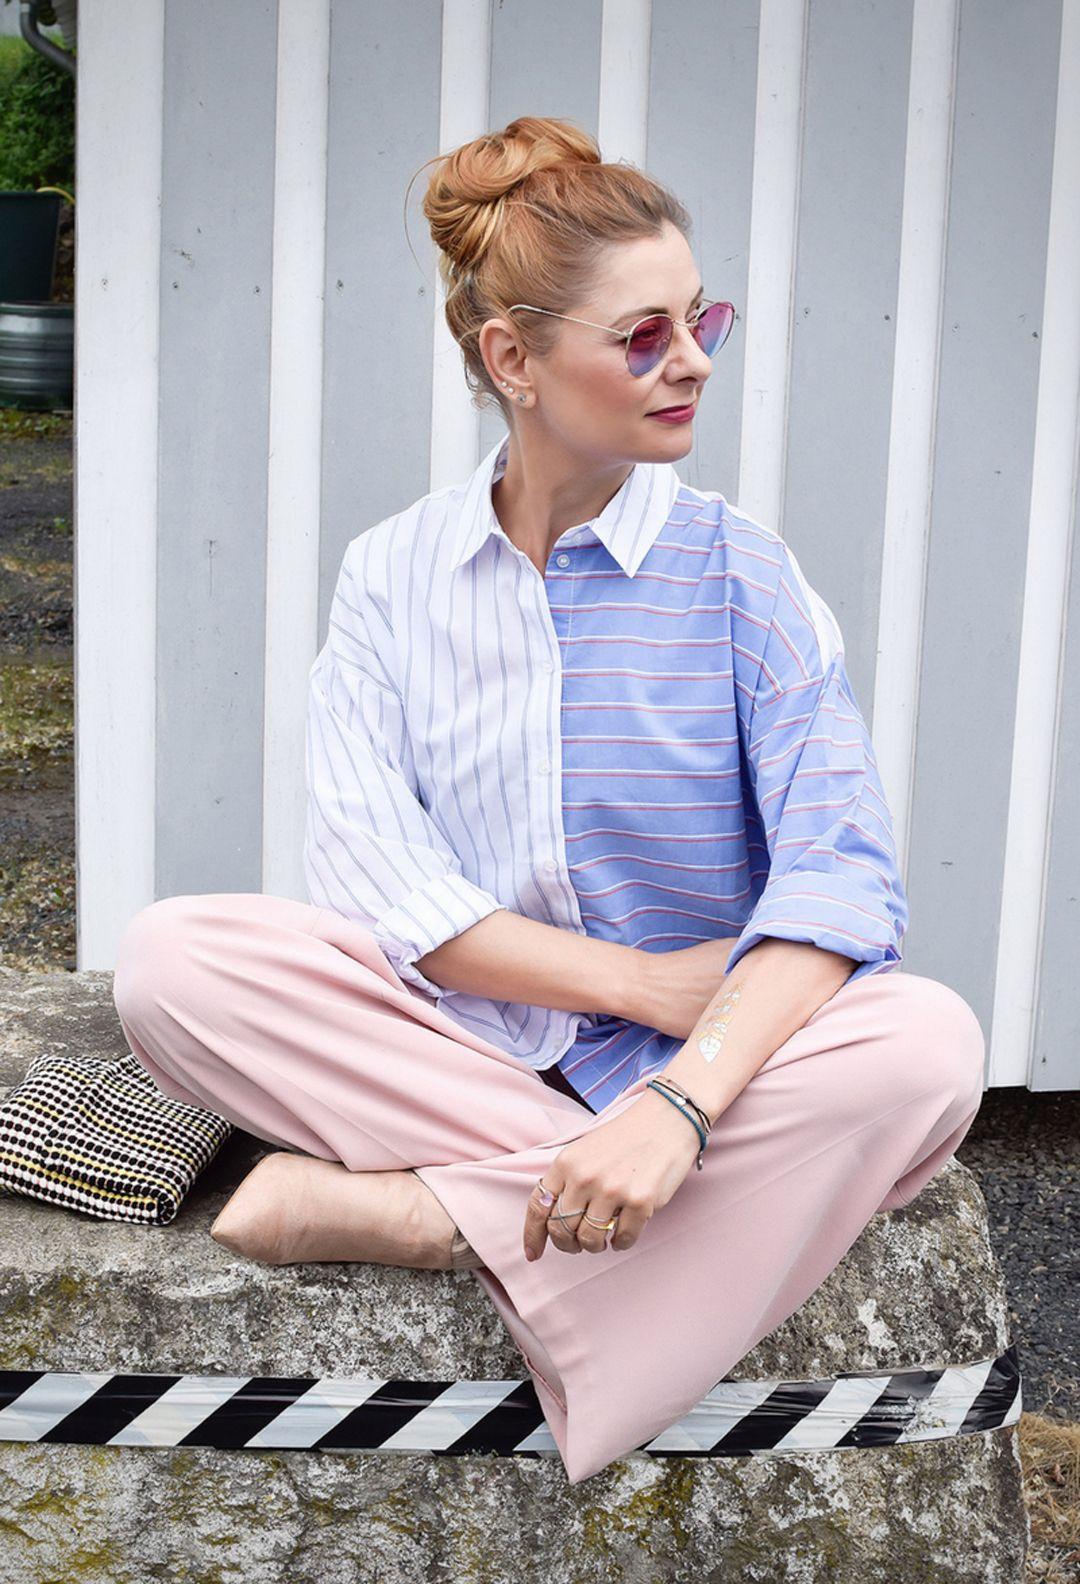 968a5c2c39 Gestreifte Hemdbluse mit rosa Palazzopants   So stylst Du eine gestreifte  Bluse   Outfit   #